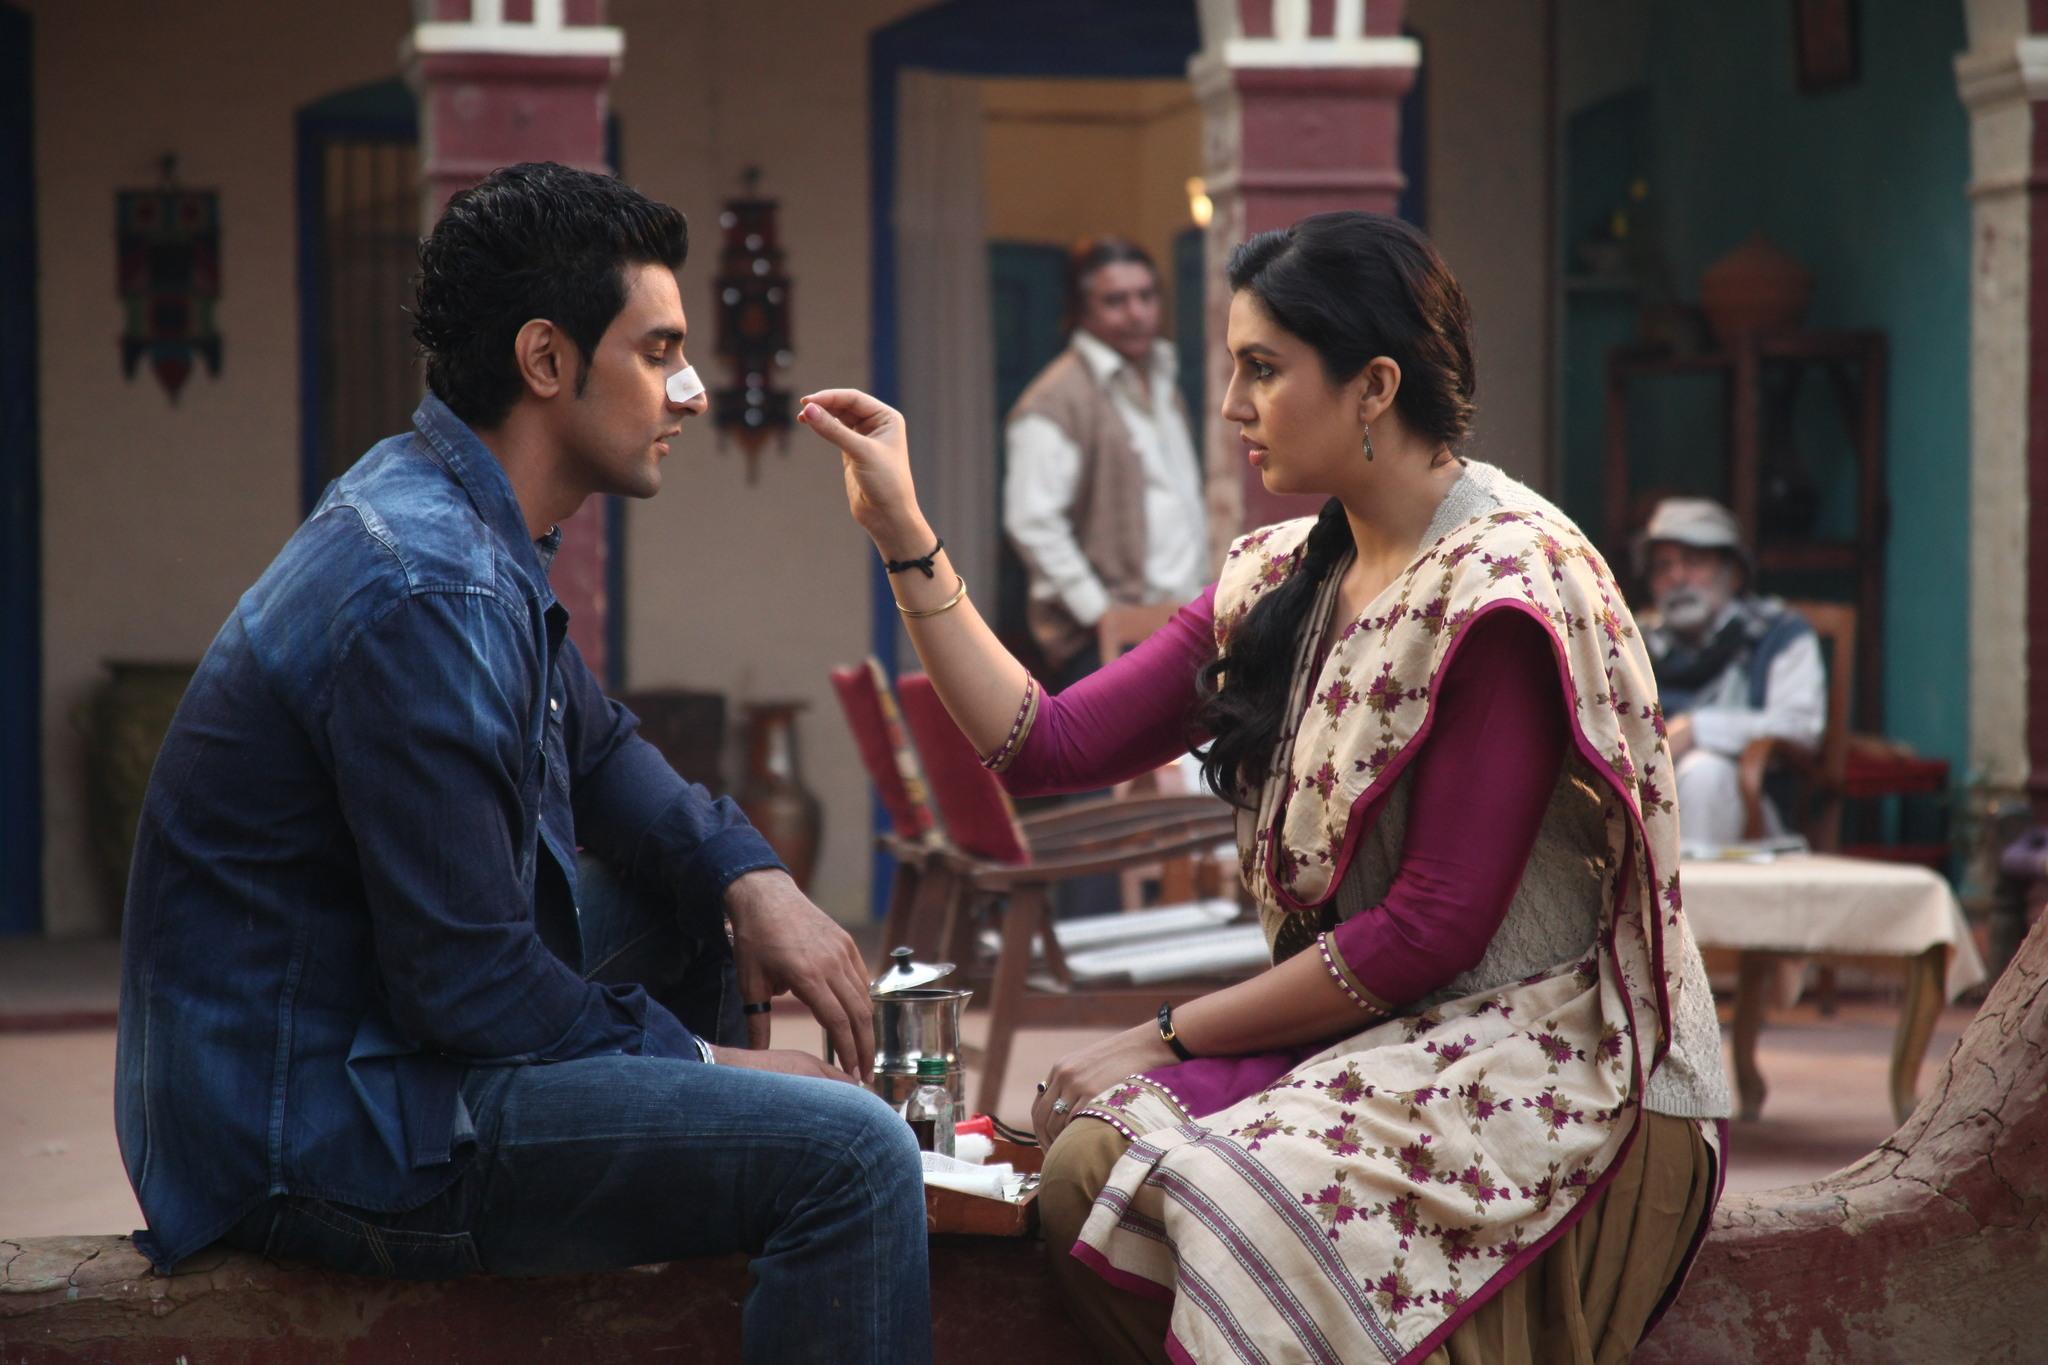 Kunal Kapoor and Huma Qureshi in Luv Shuv Tey Chicken Khurana (2012)